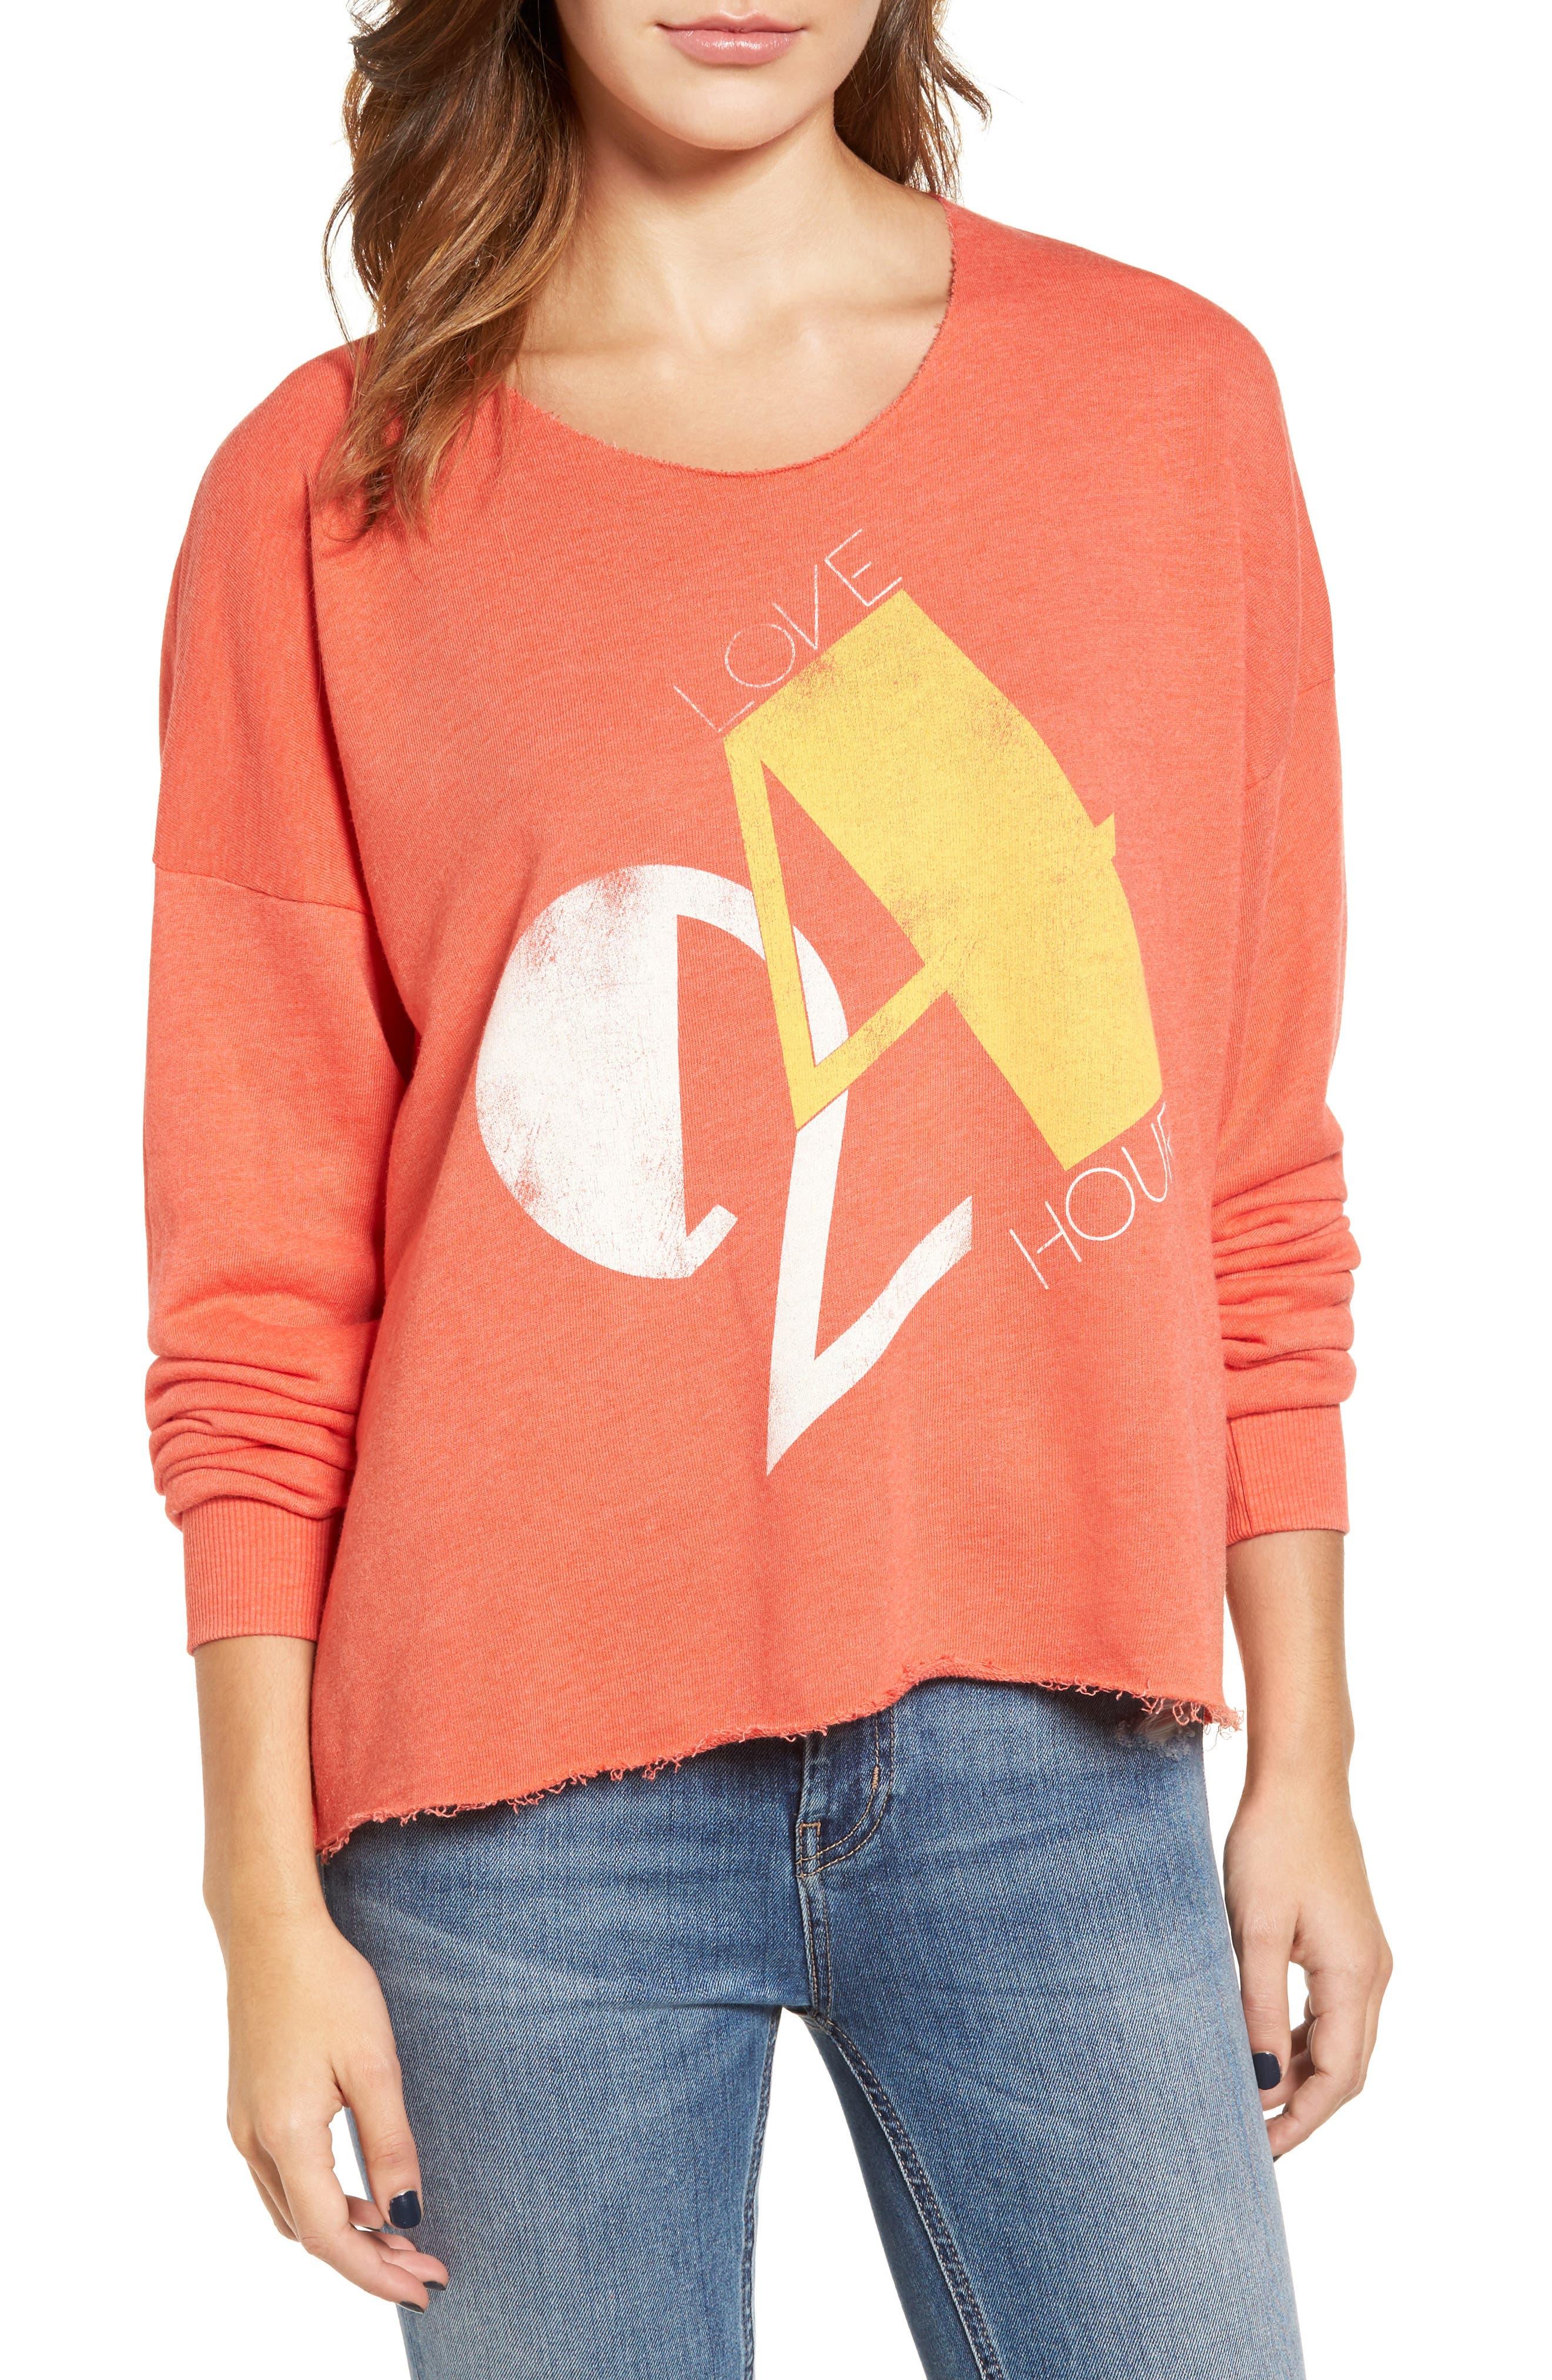 Love 24/7 Sweatshirt,                         Main,                         color, 640